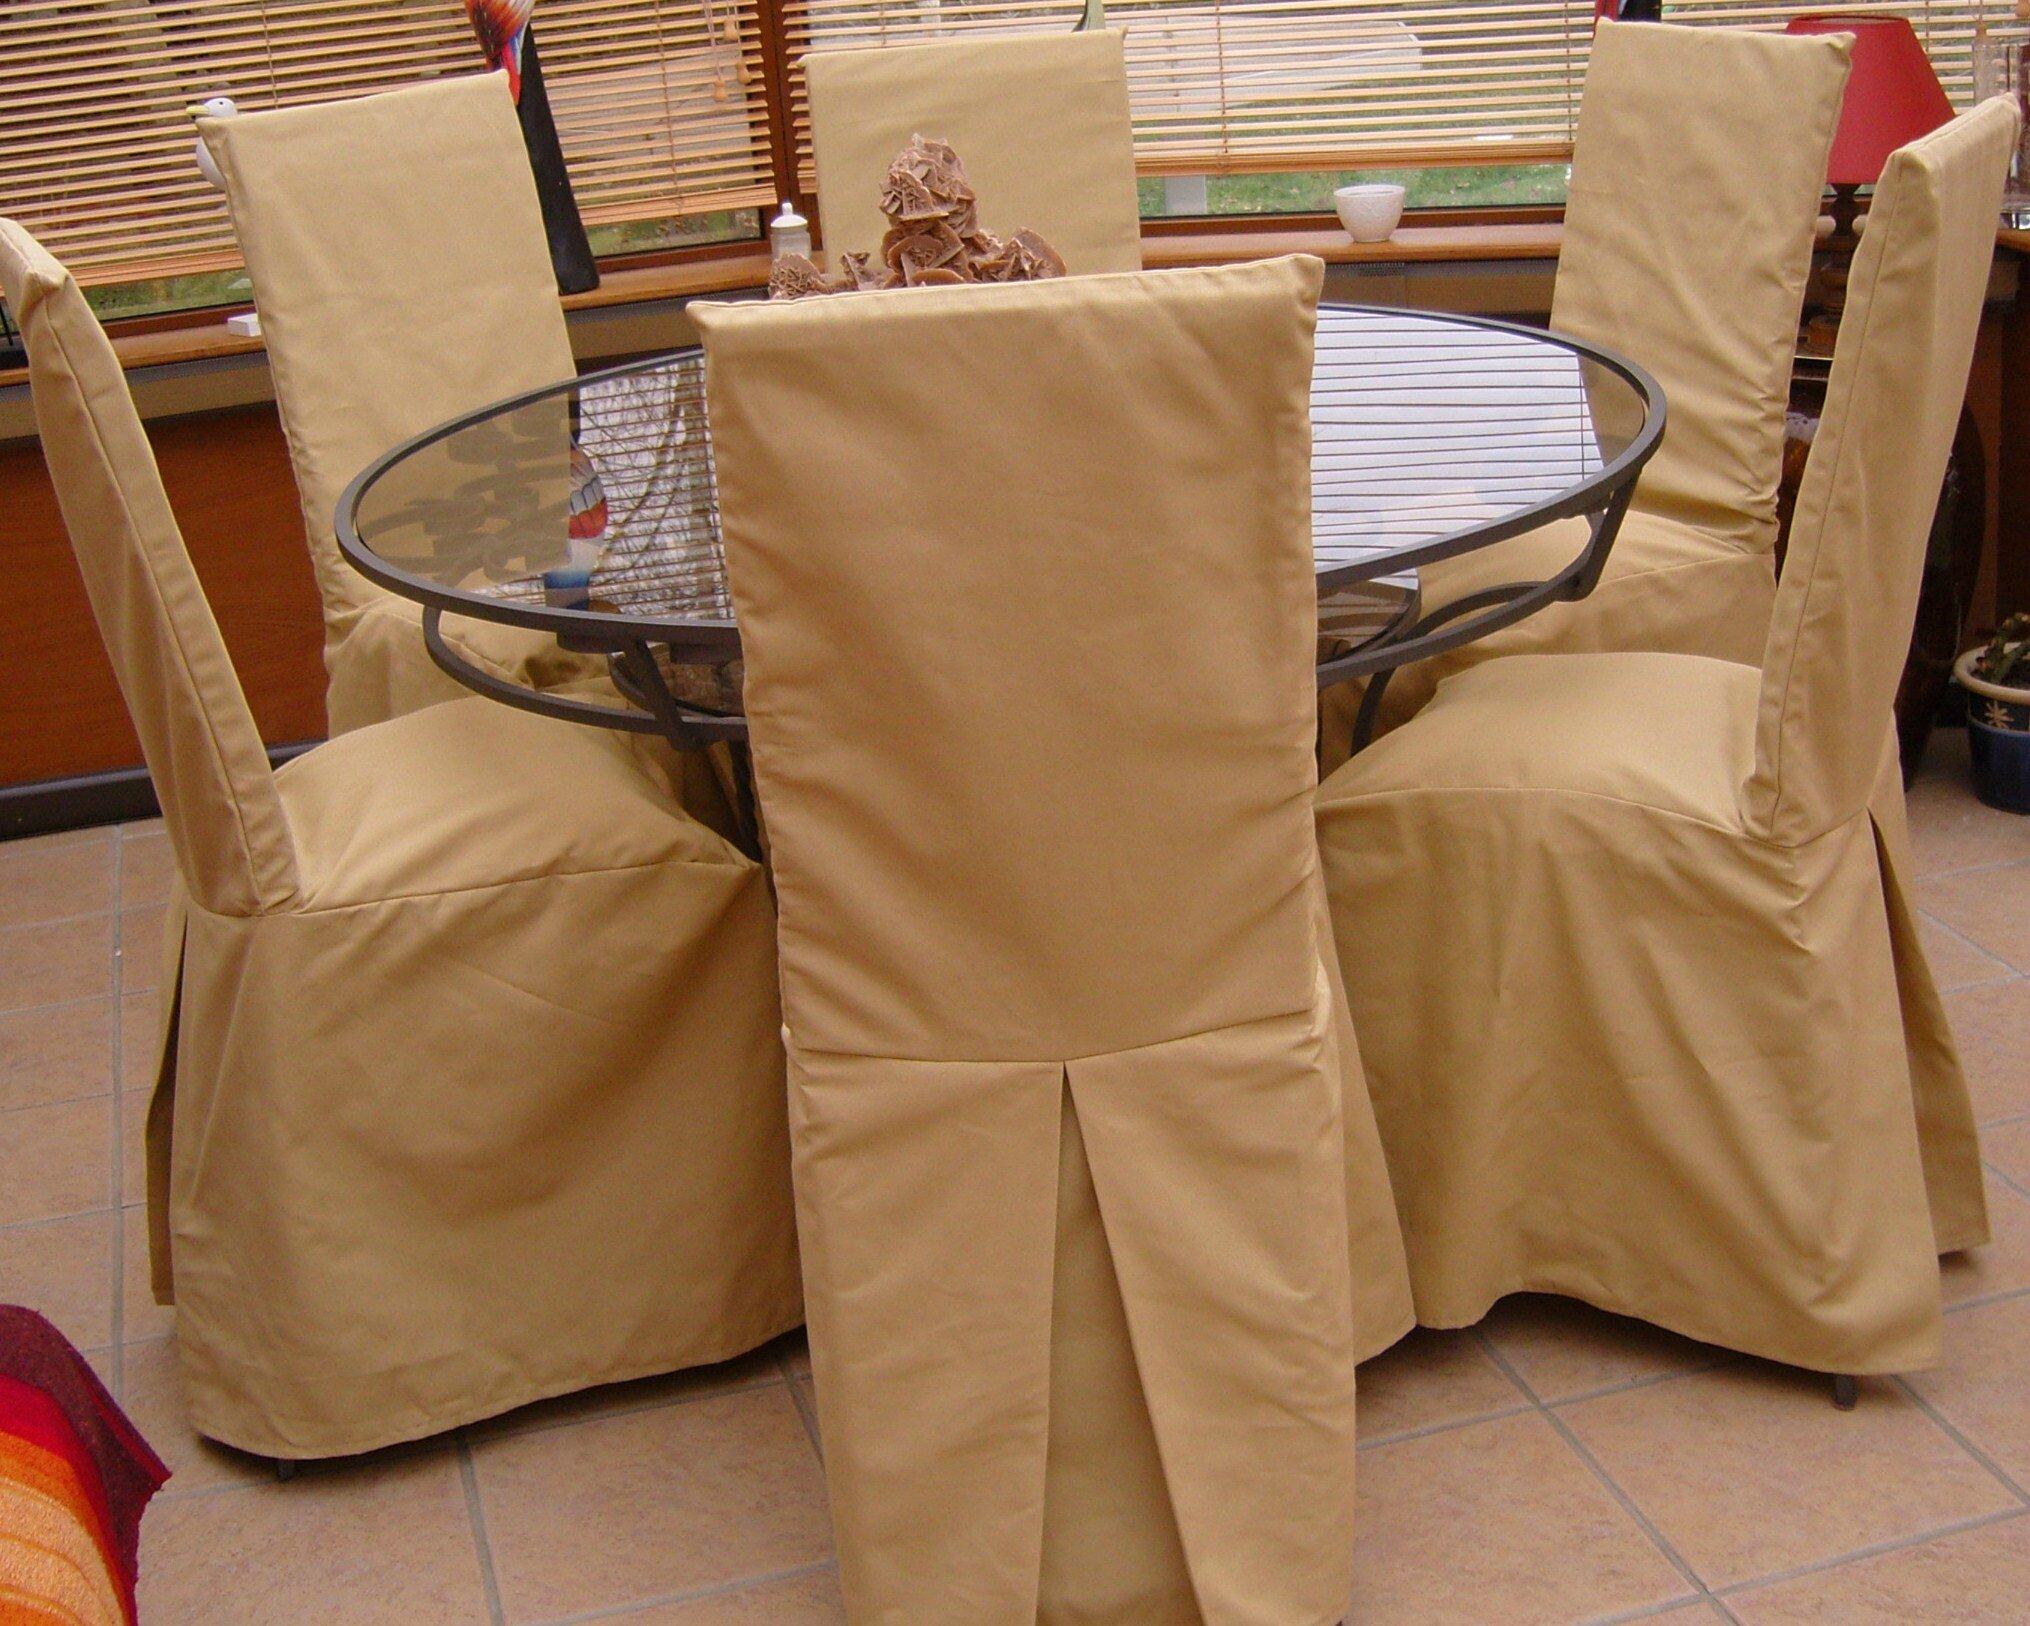 housses de chaises sur mesure made in france. Black Bedroom Furniture Sets. Home Design Ideas